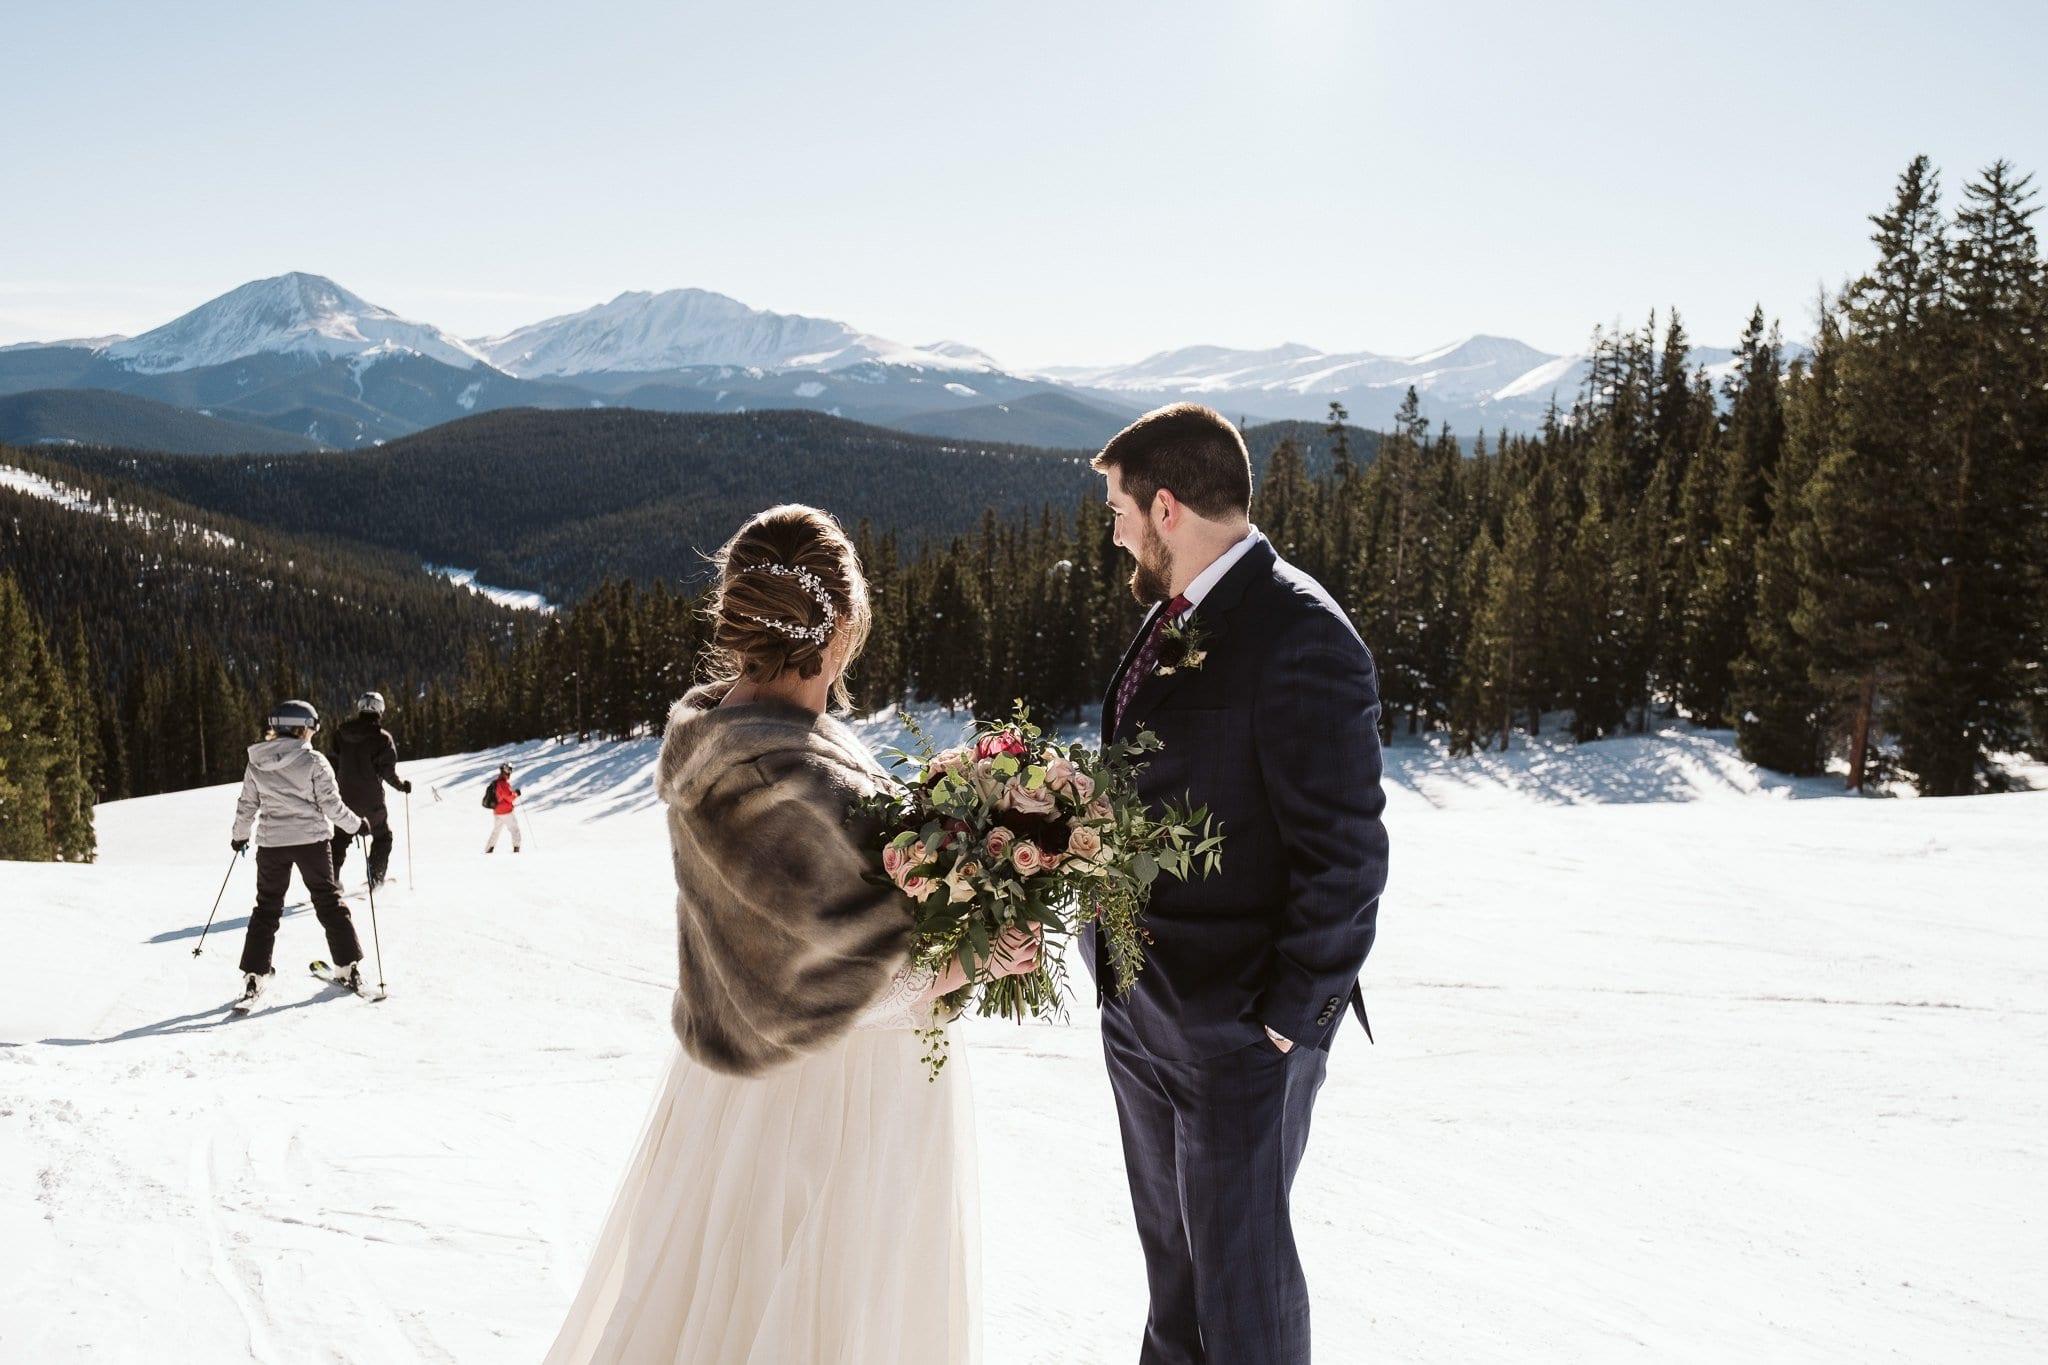 Winter elopement at Keystone Ski Resort in Colorado.